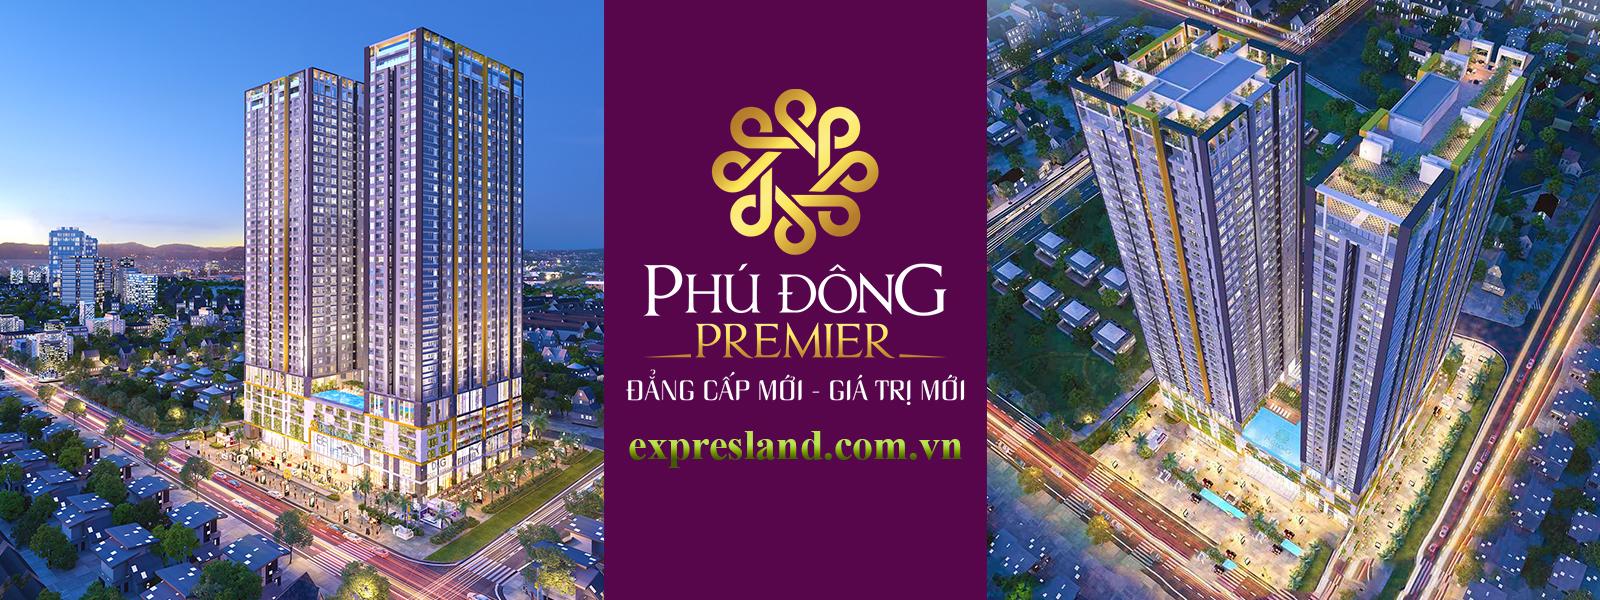 Ban ner phu dong premier 2020 hinh 2 expresslandcomvn